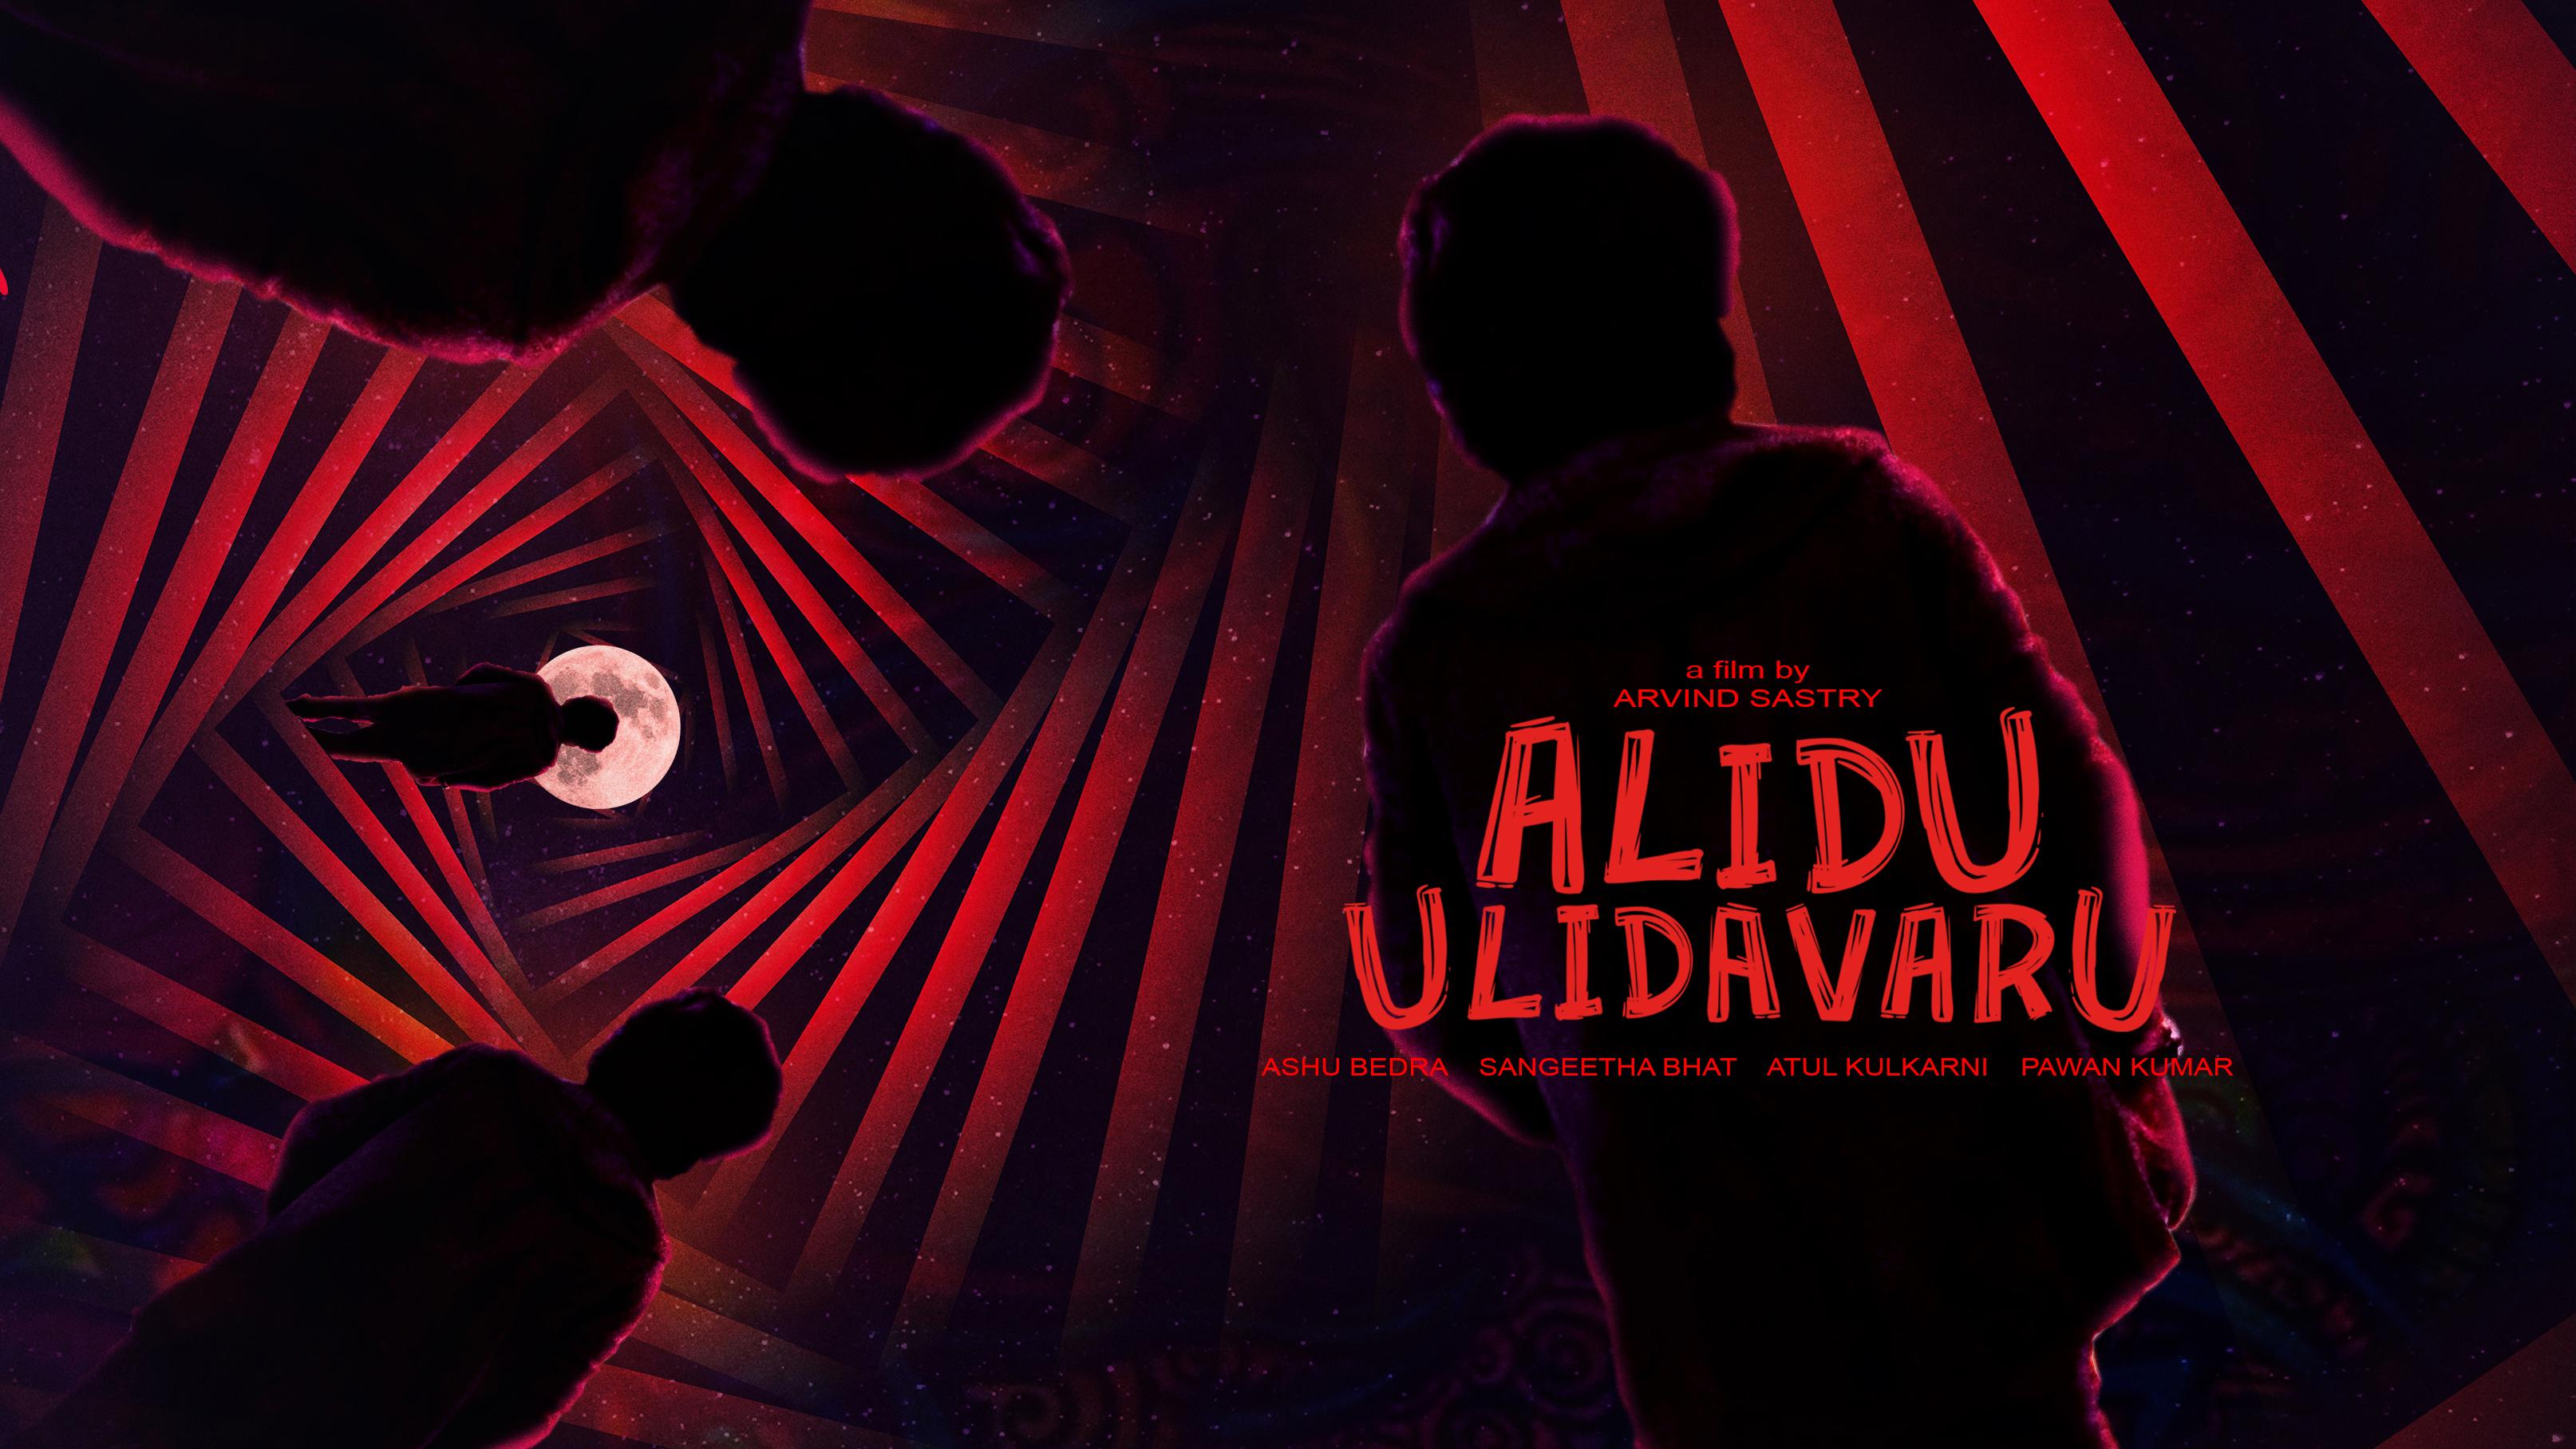 Alidu Ulidavaru